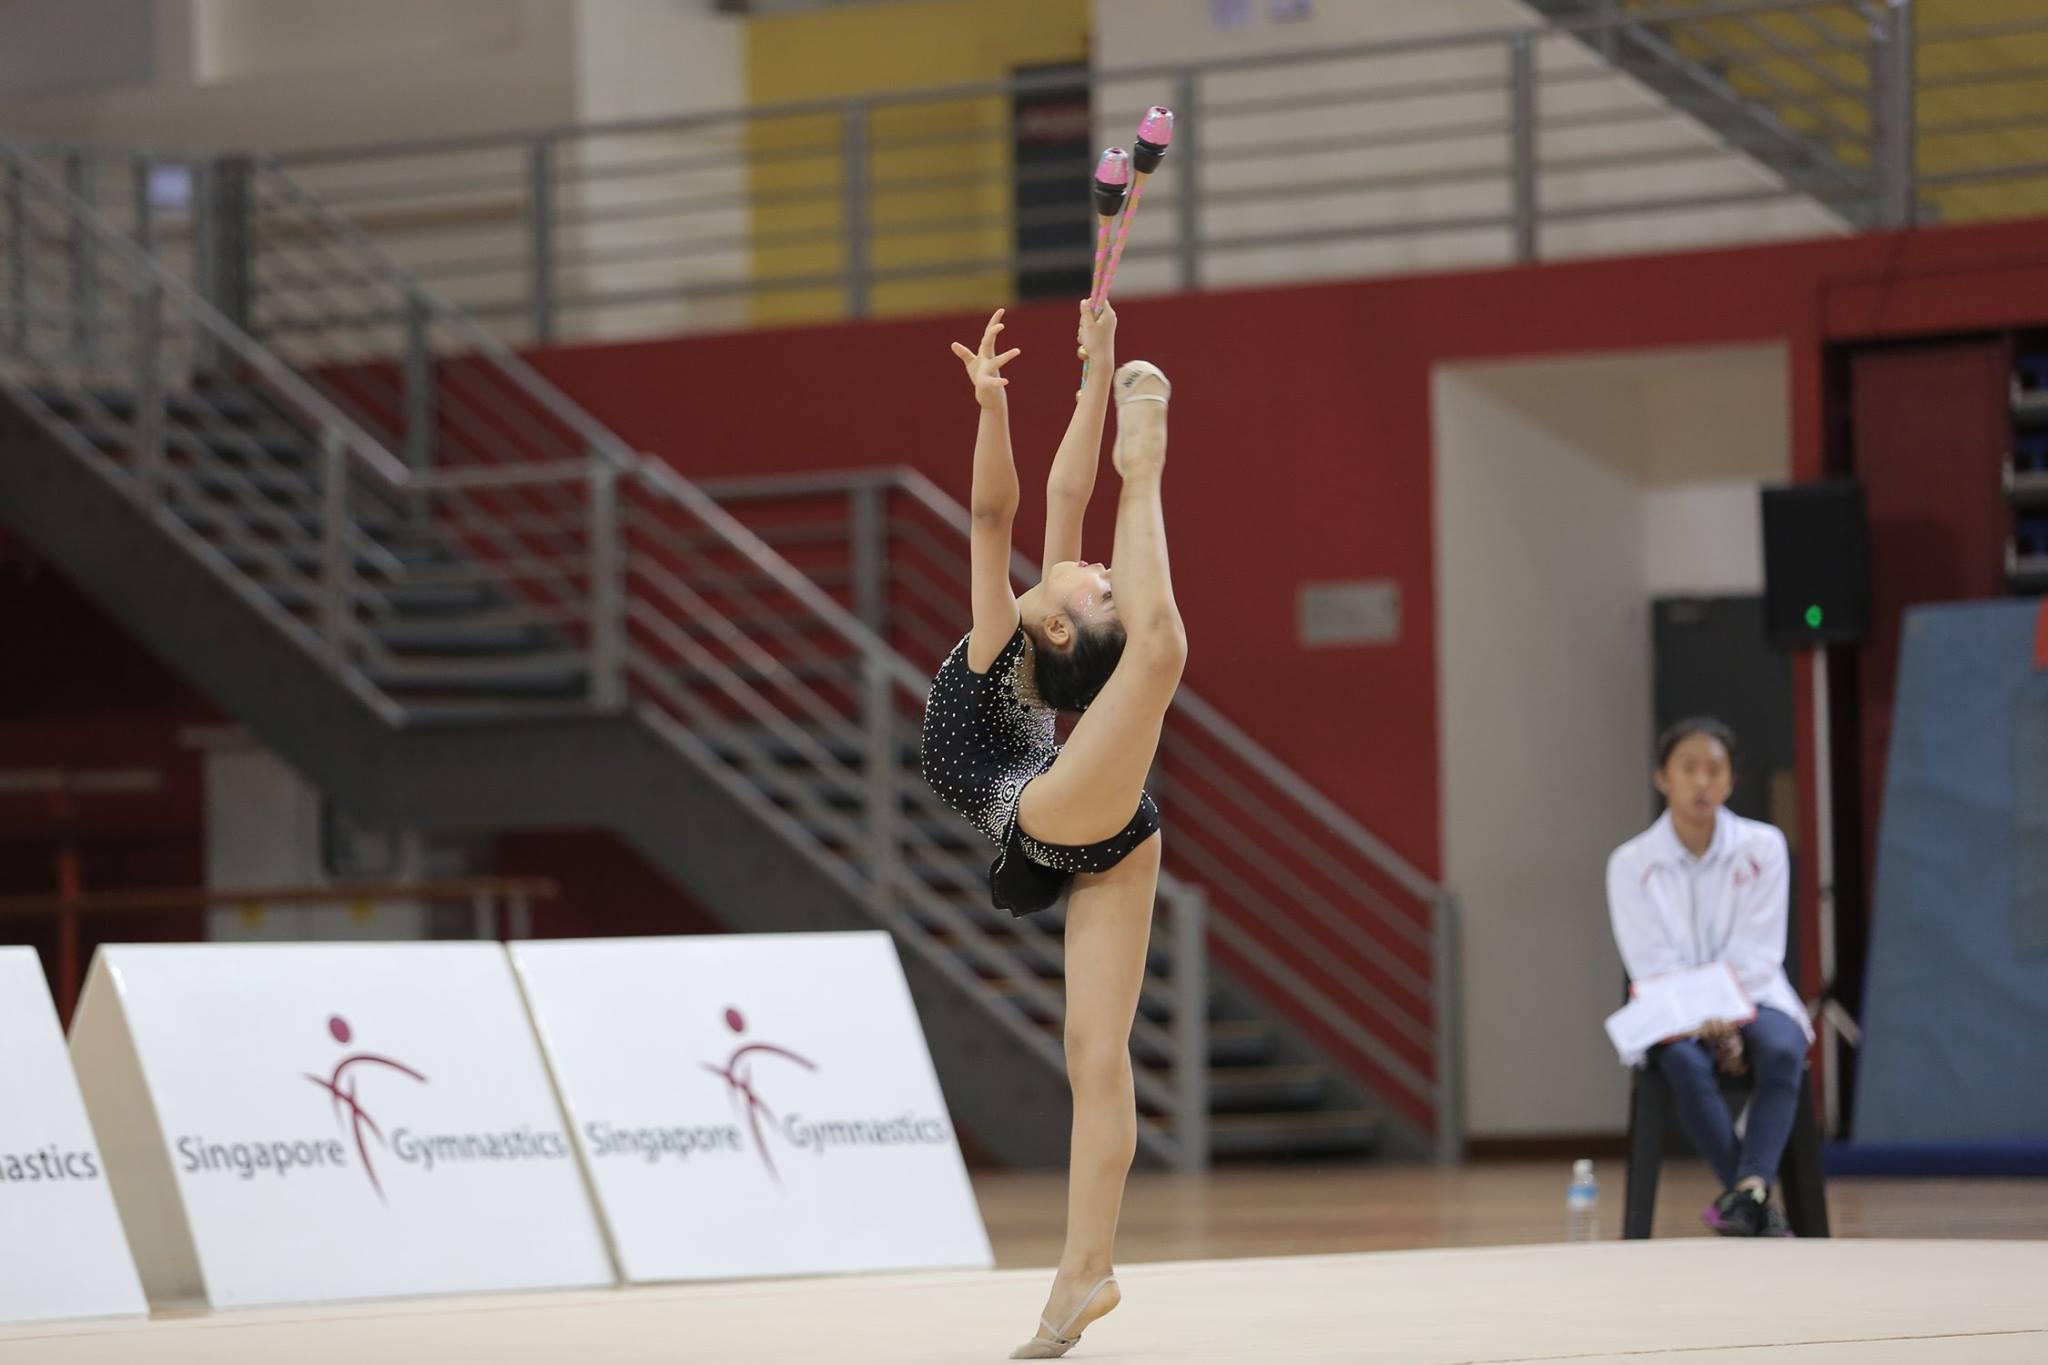 Singapore Gymnastics Open Championships 2017 97